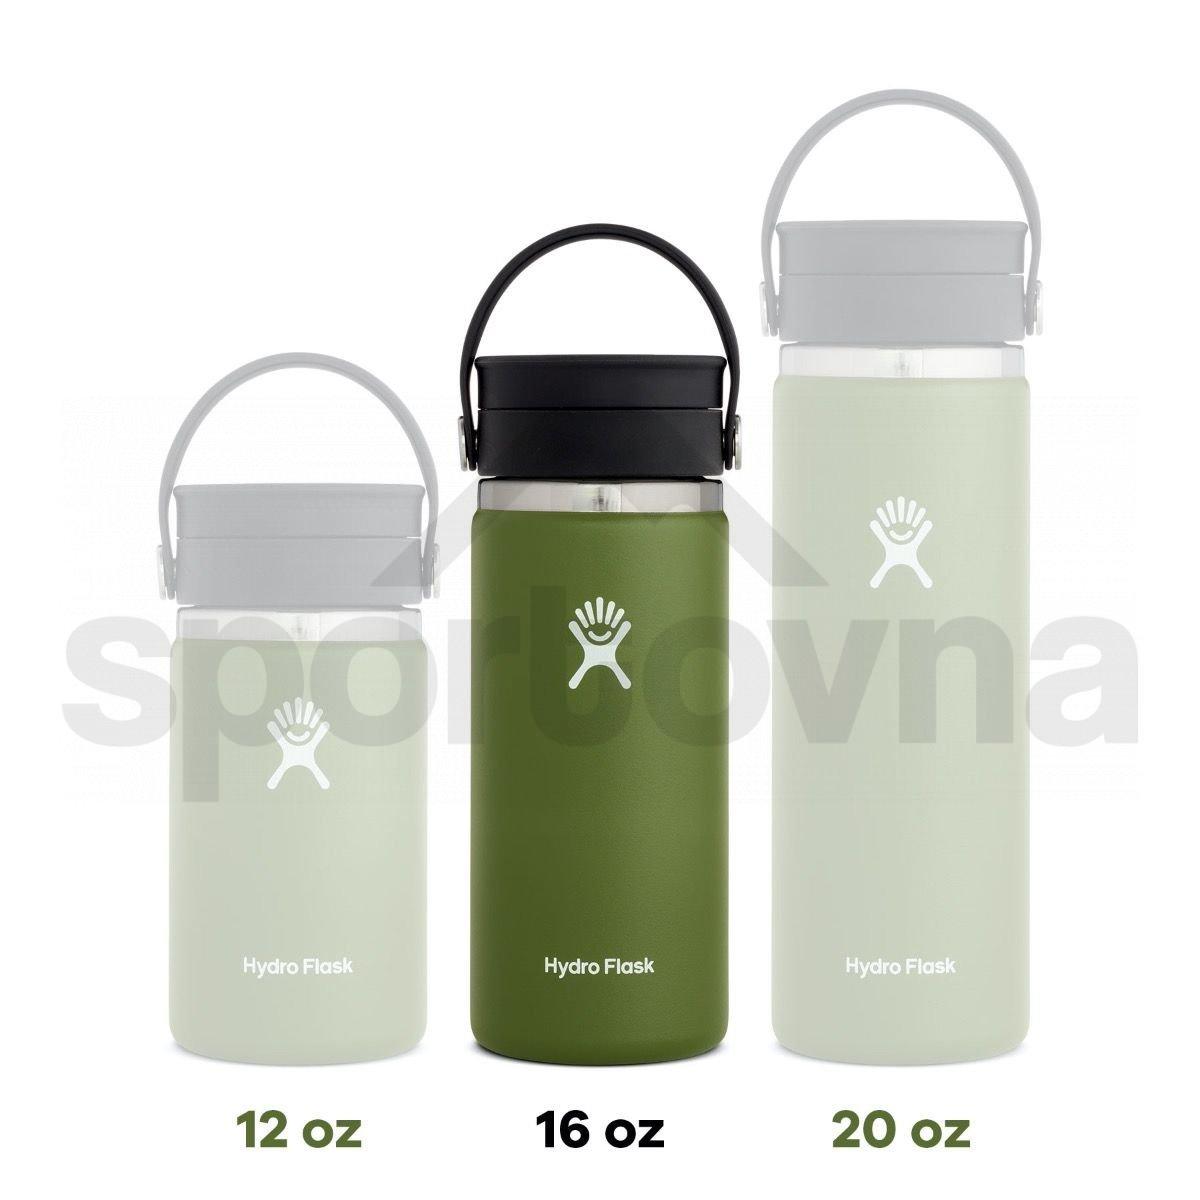 Termohrnek Hydro Flask Coffee Wide Mouth Flex Sip Lid 16 oz - růžová